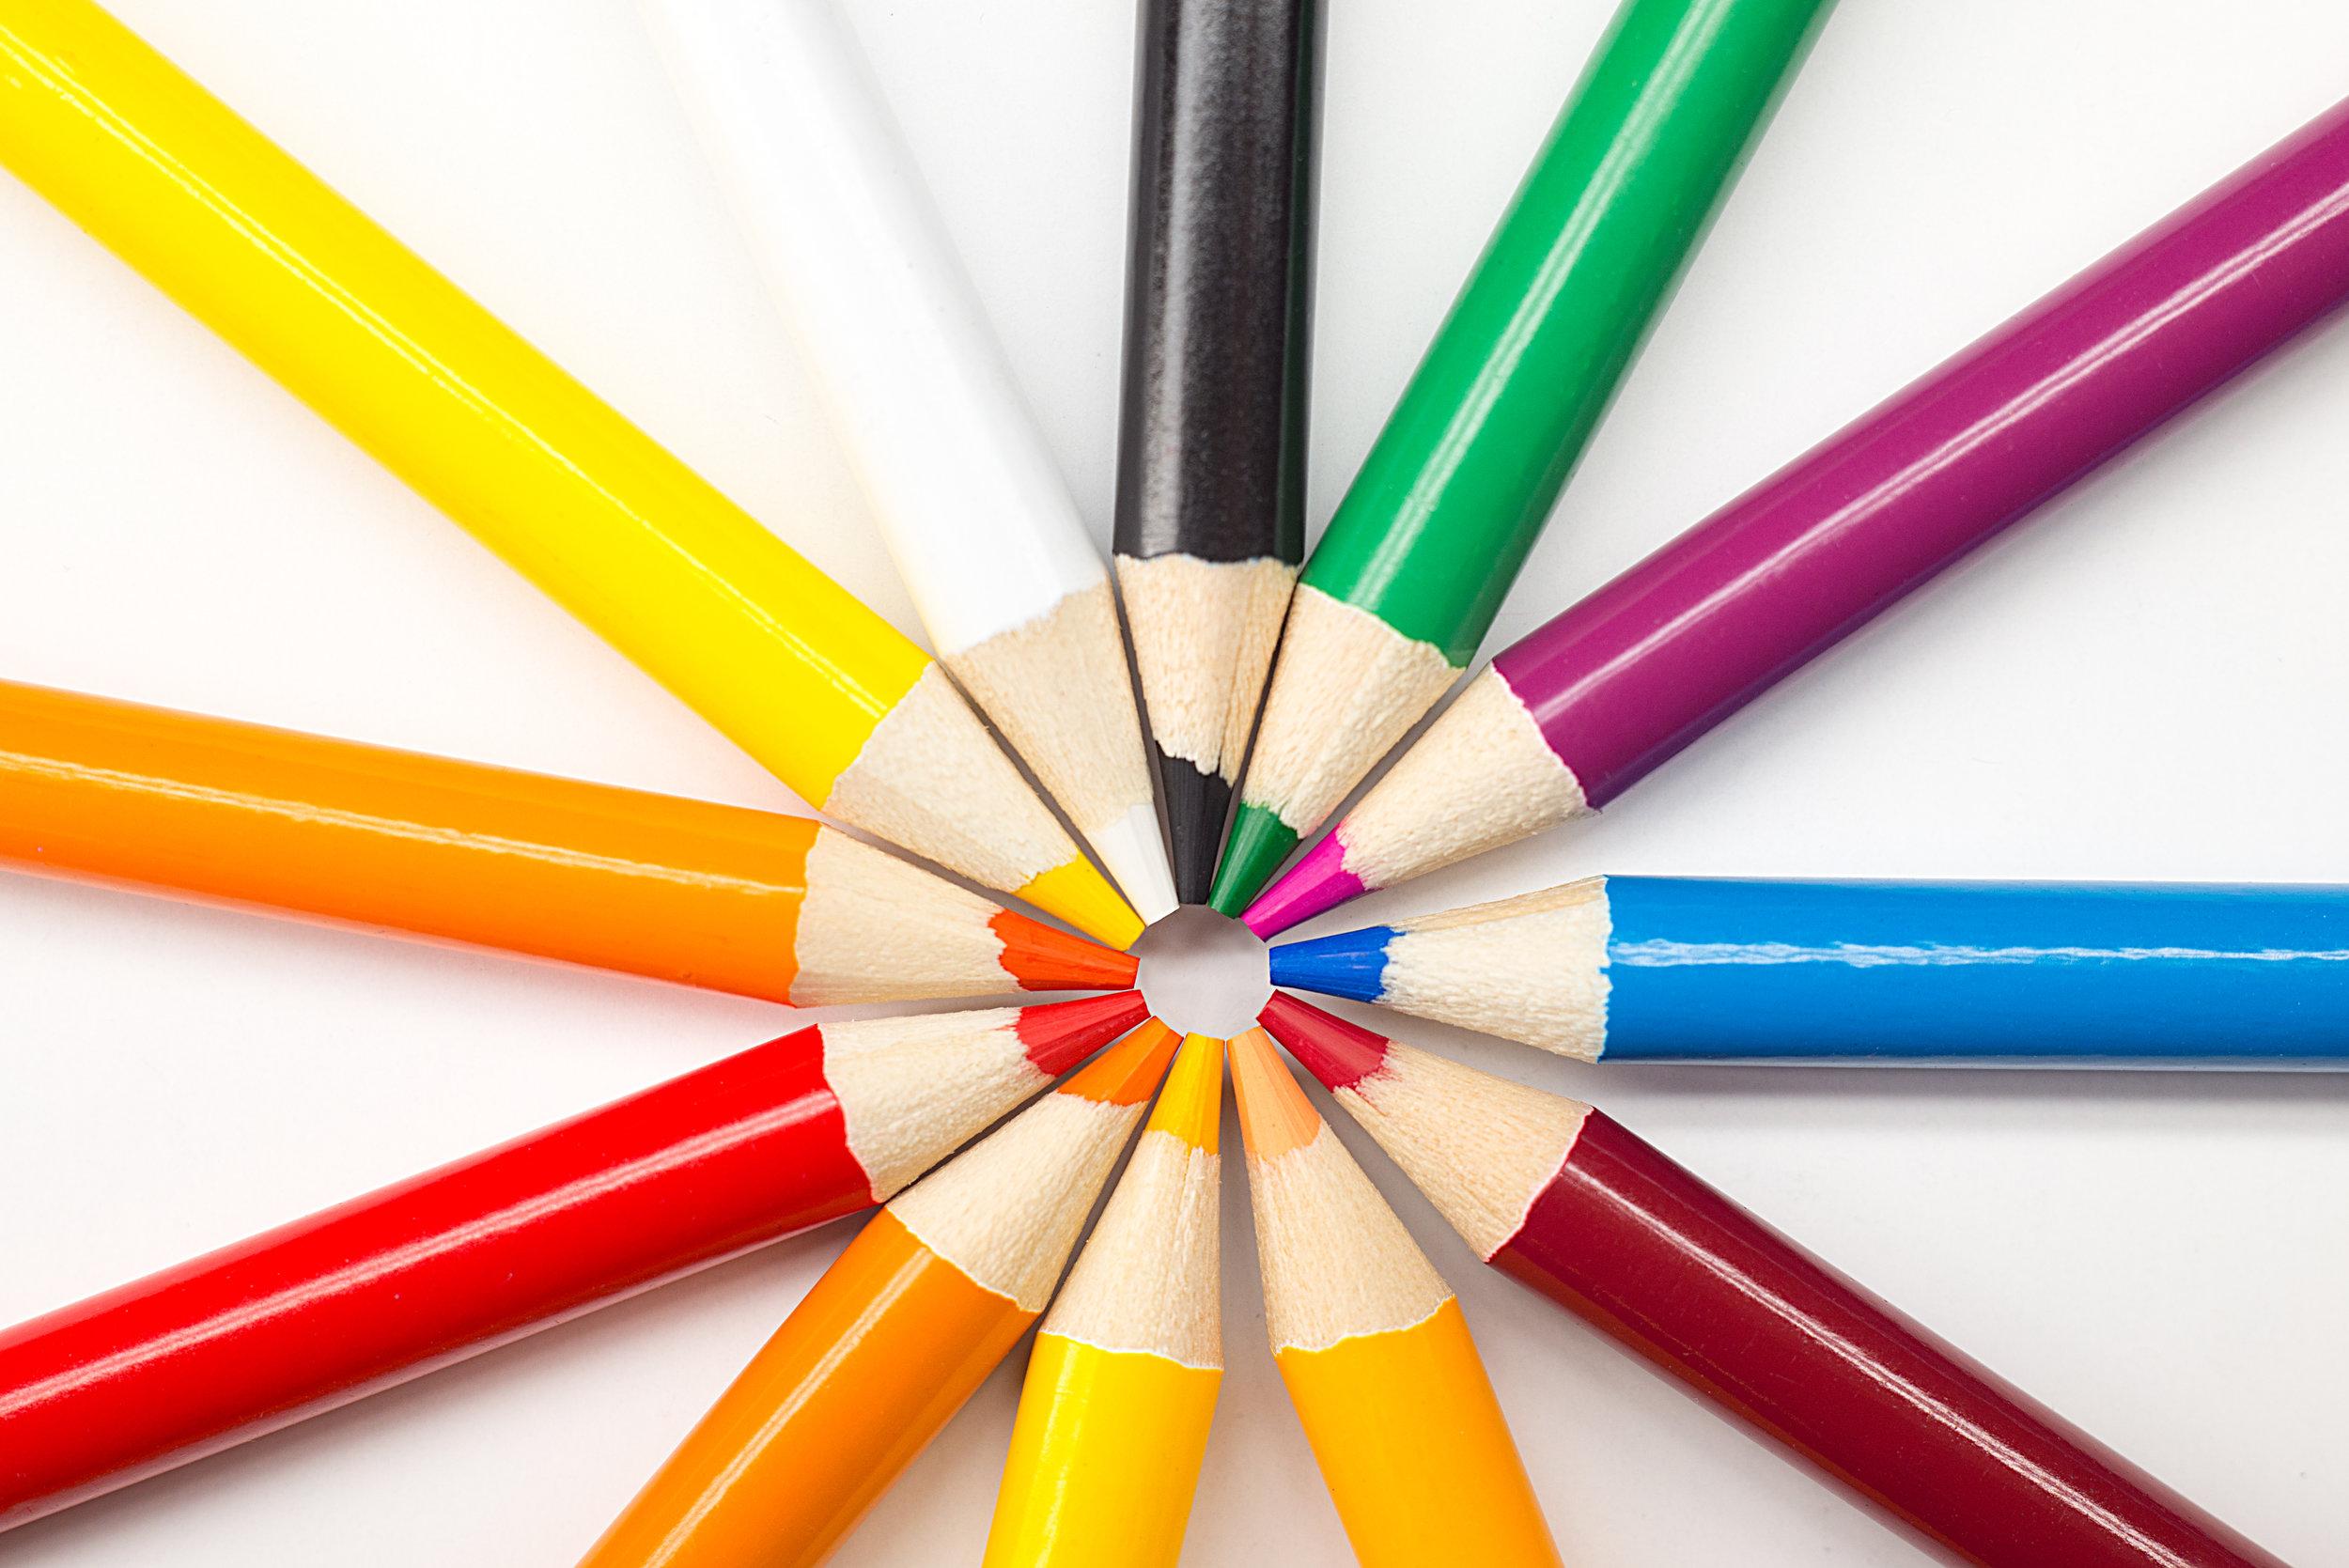 Twelve colouring pencils